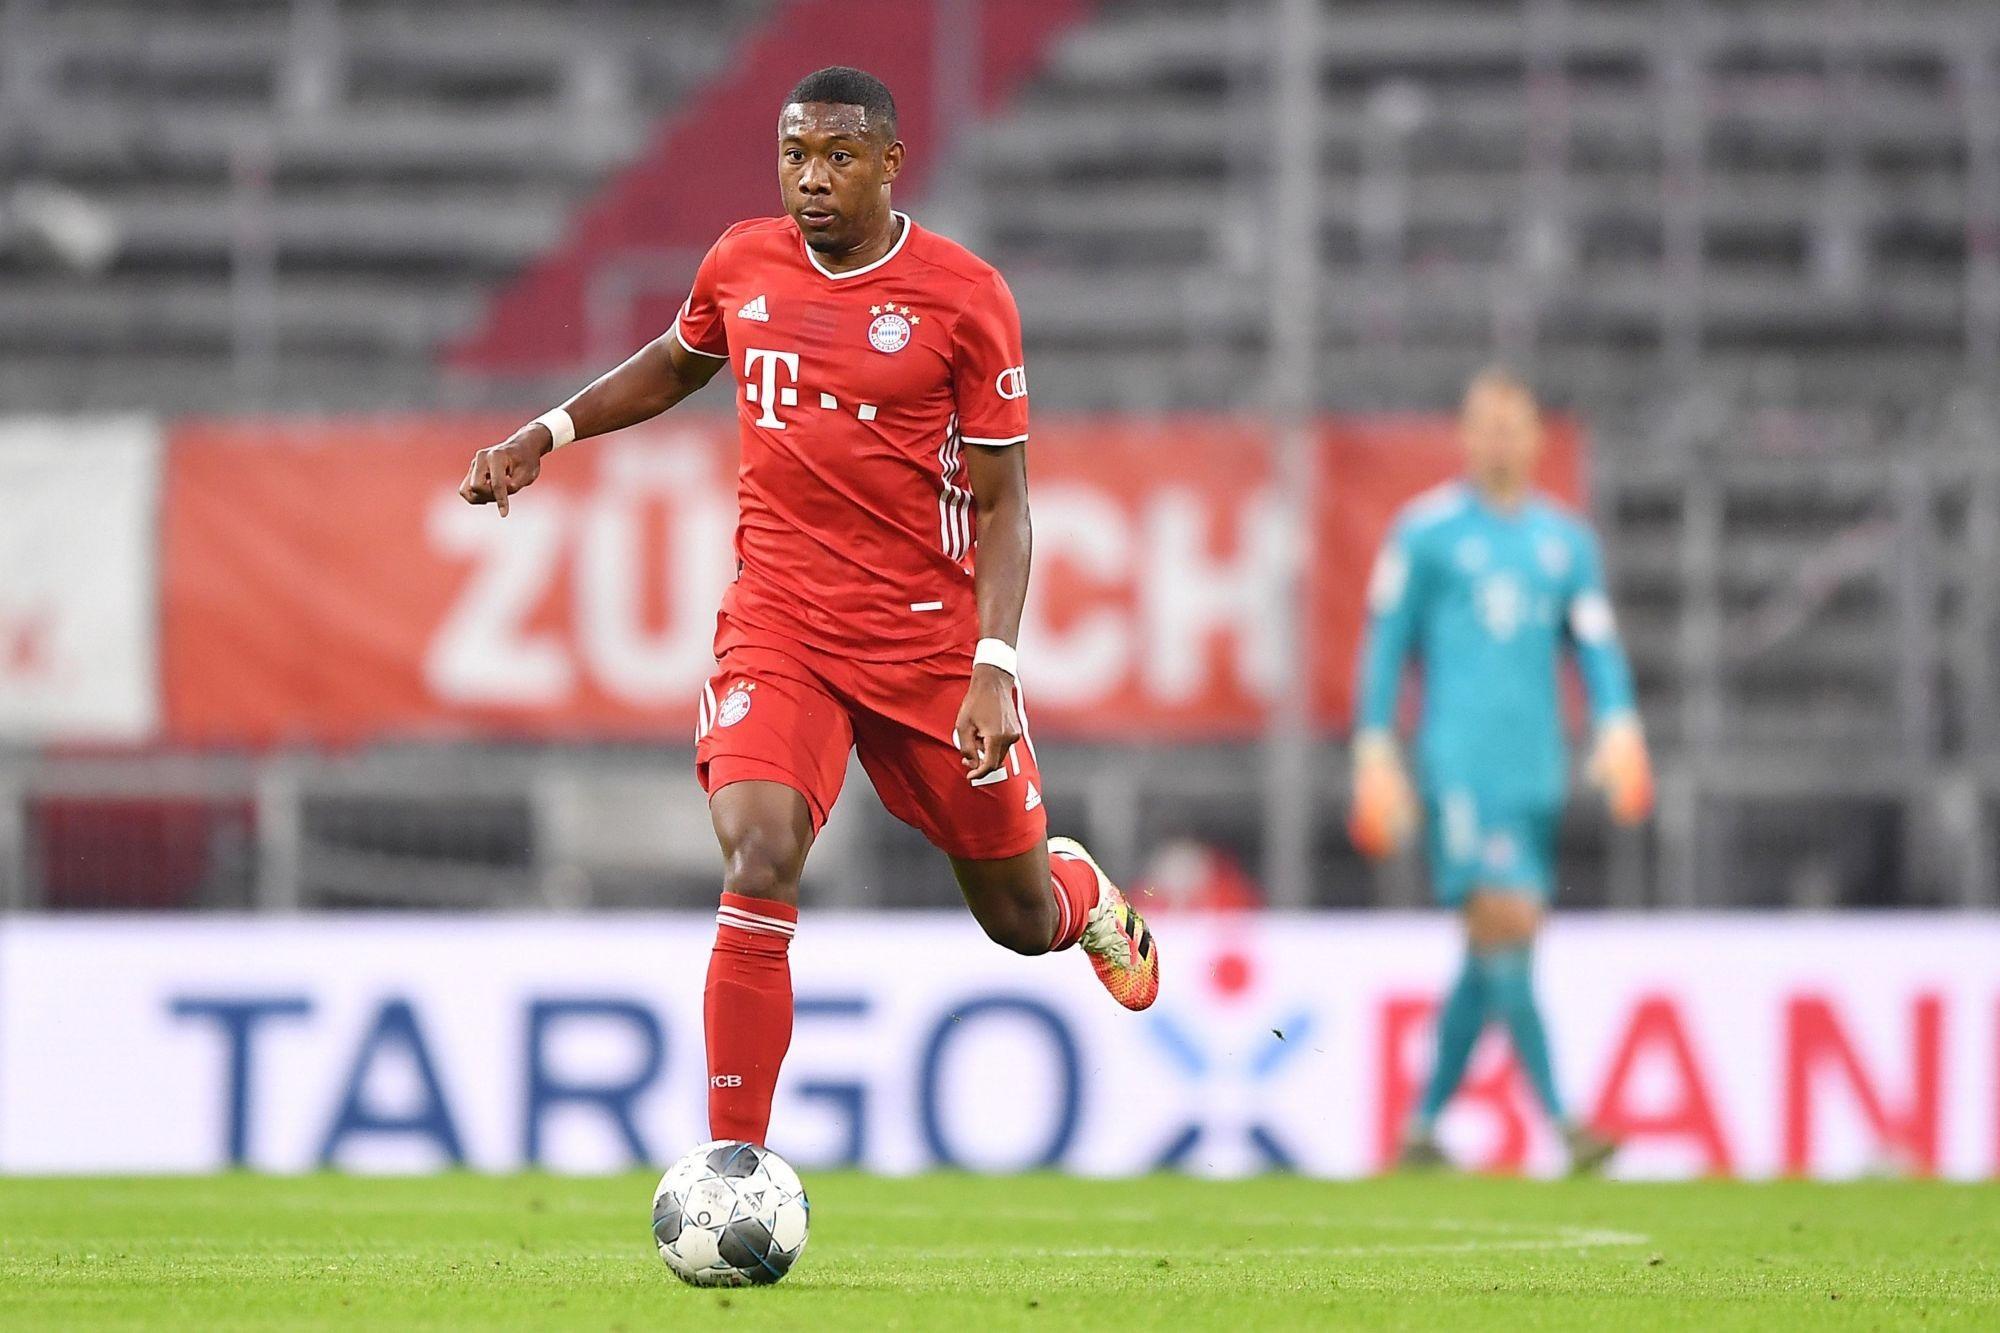 "Mercato - L'agent de David Alaba discute avec le PSG, le Real reste le ""rêve"" selon Bild"